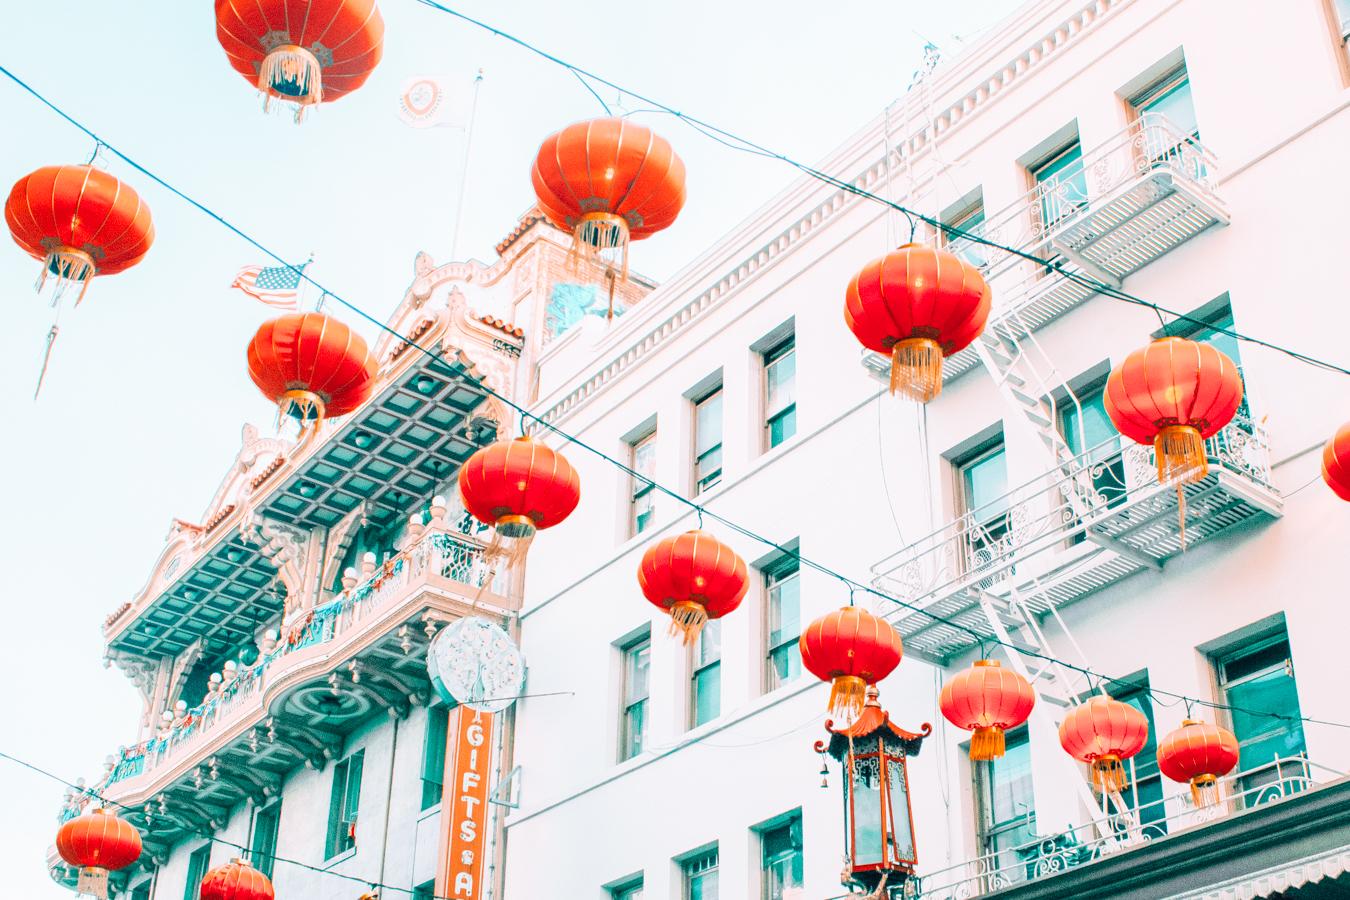 View of Chinatown